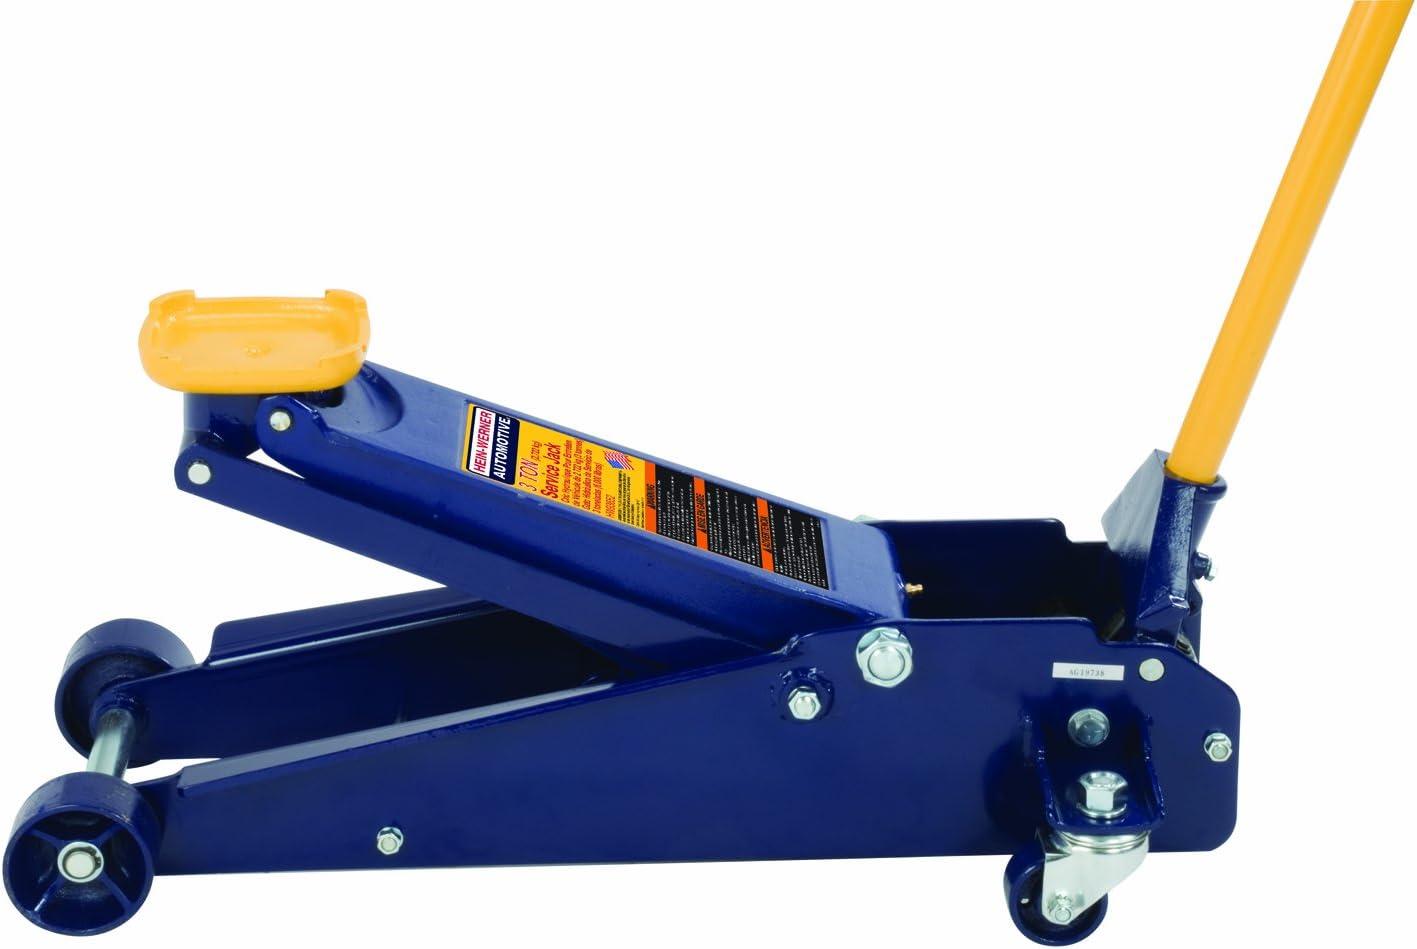 Hein-Werner HW93652 Blue Heavy Duty Service Jack-3 Ton Capacity